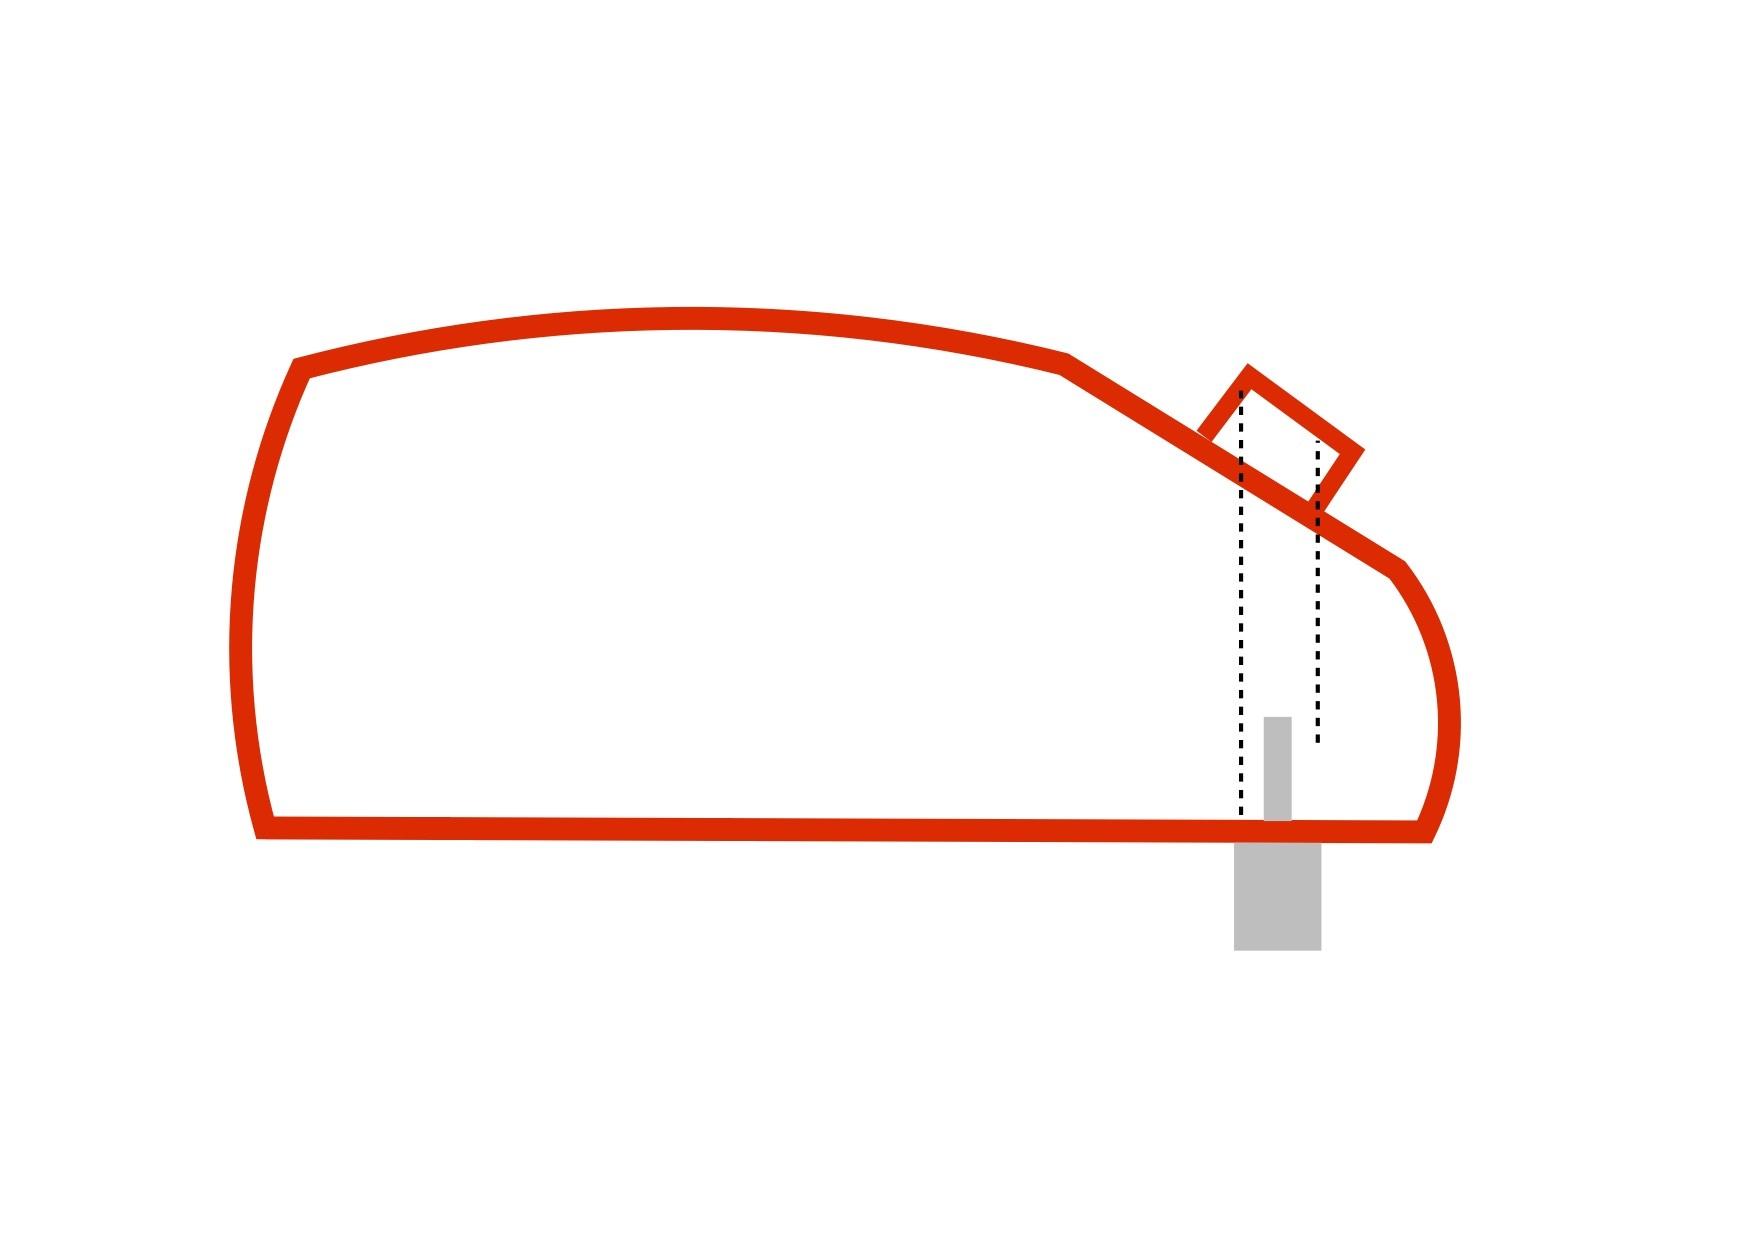 【VANVAN】ガソリンタンク増設作戦(その4)_e0159646_10230560.jpg